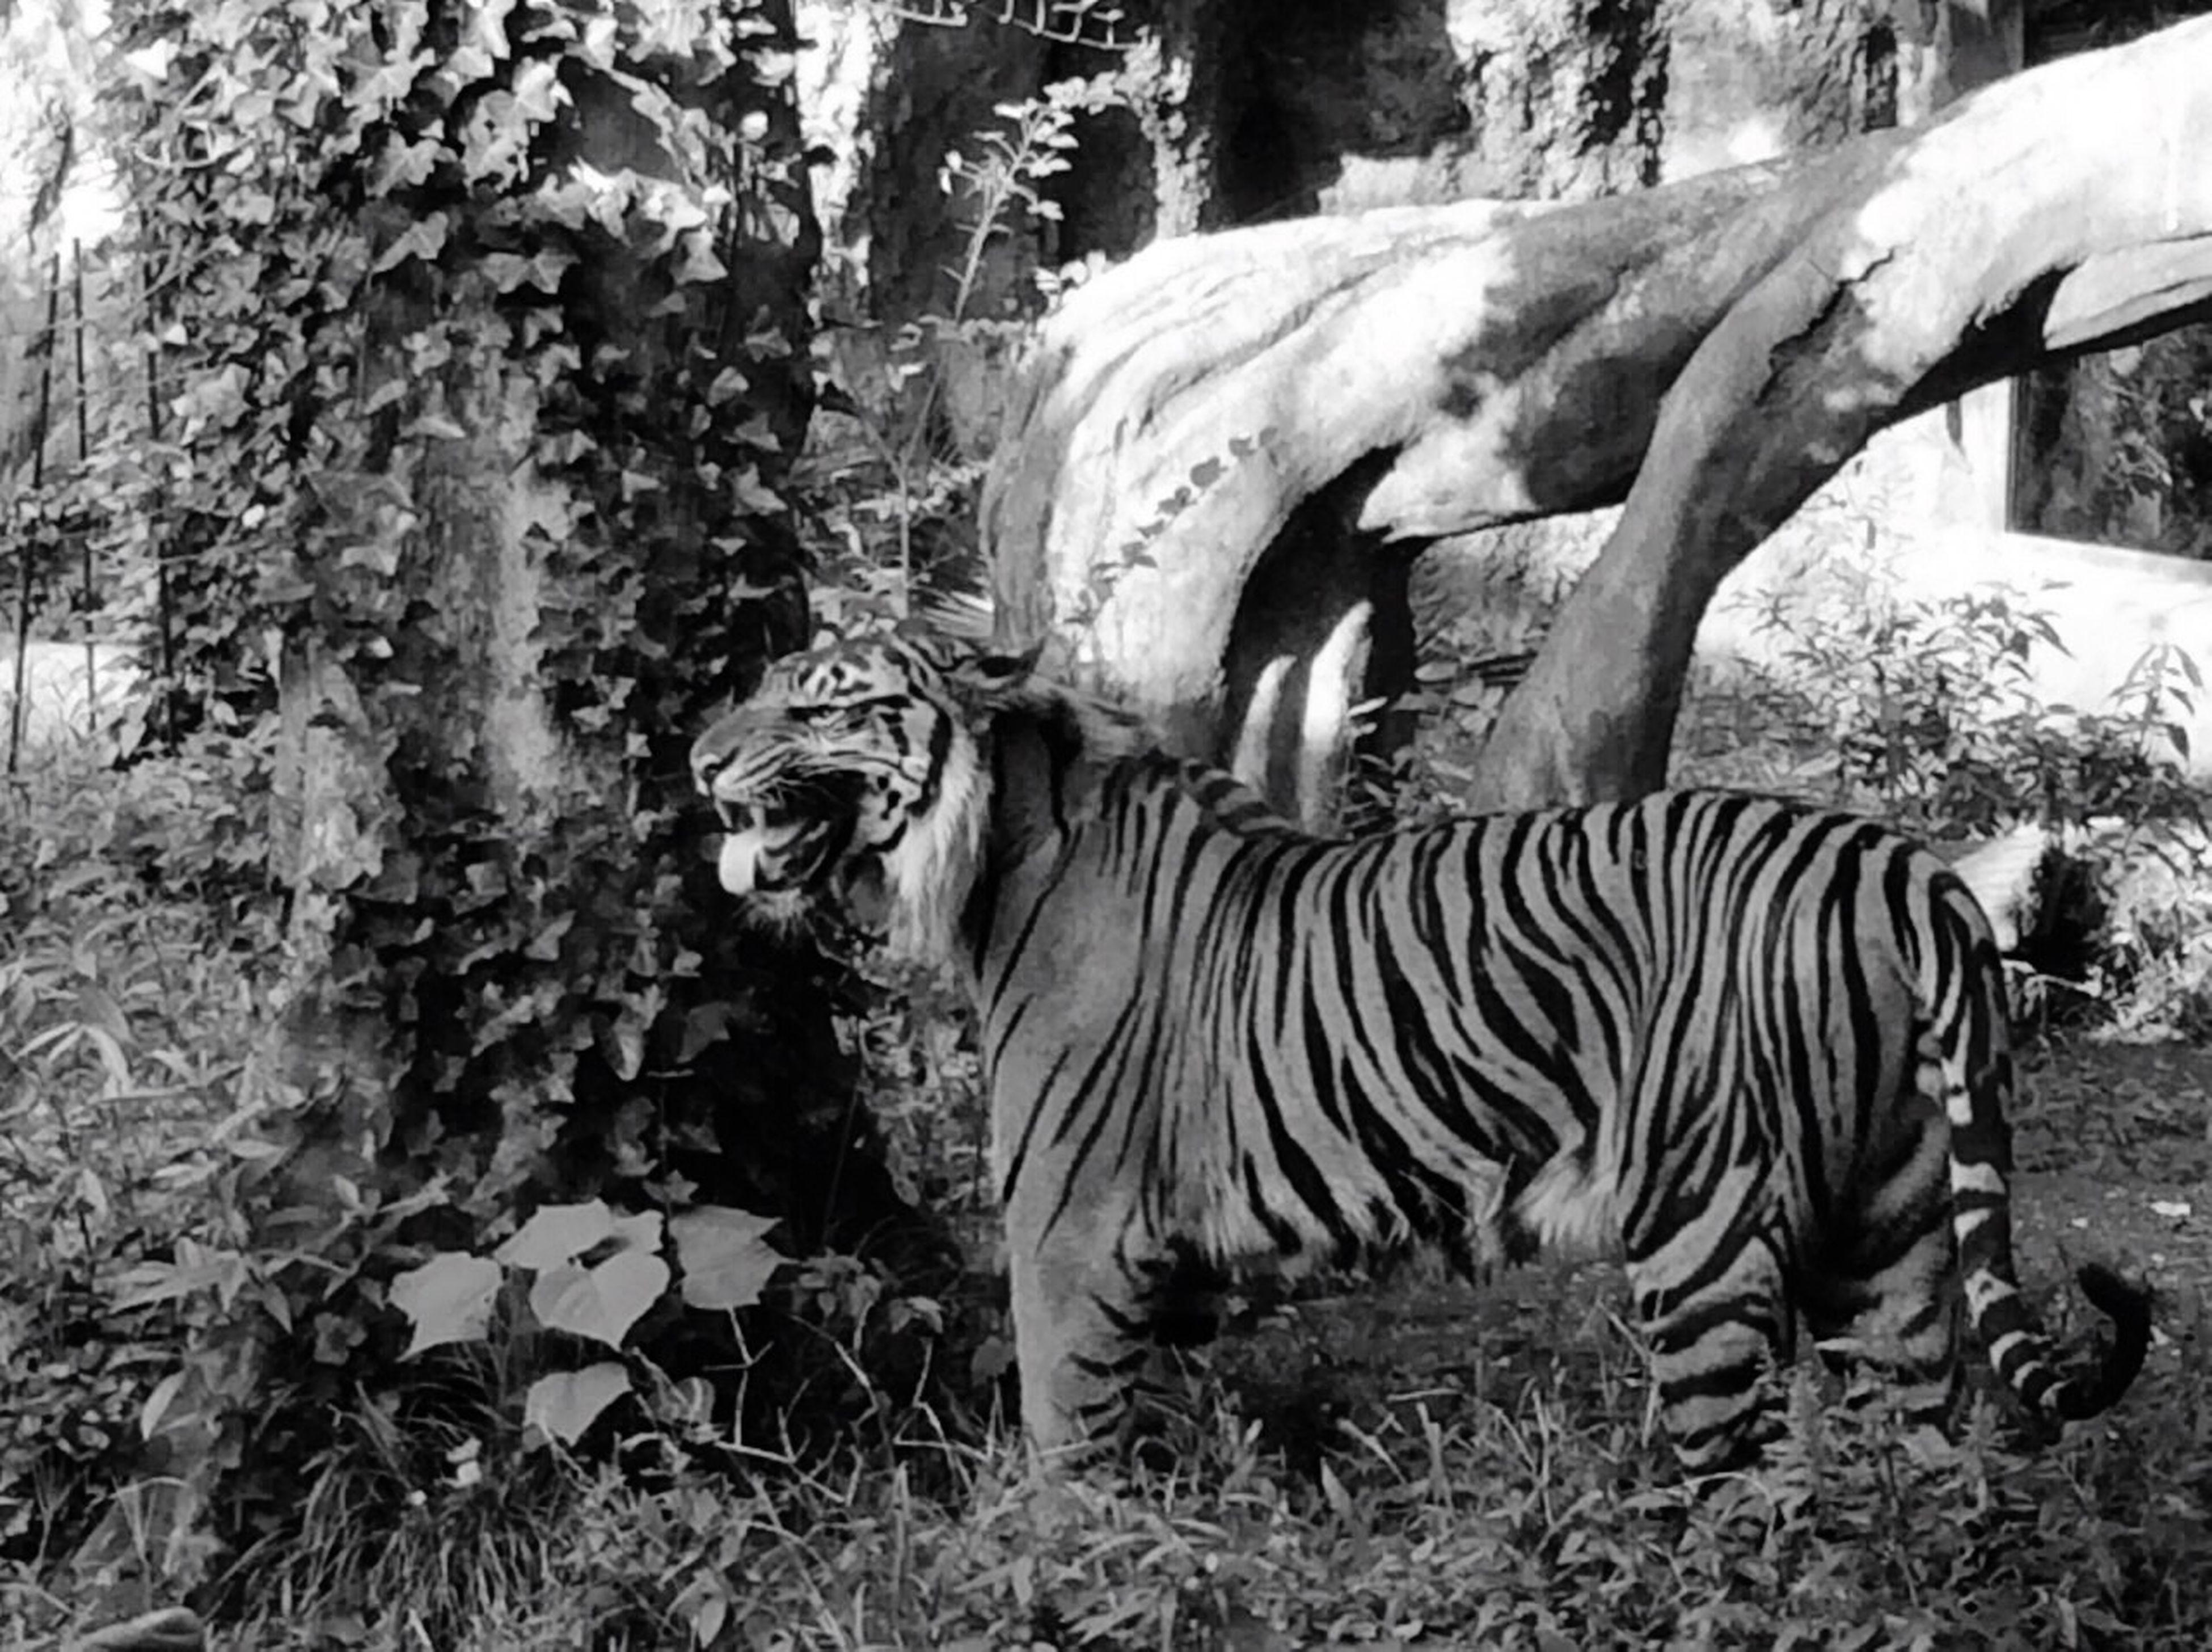 Zoo Taking Photos Hello World Animal Blackandwhite Iphonephotography EyeEm Best Edits EyeEm Best Shots